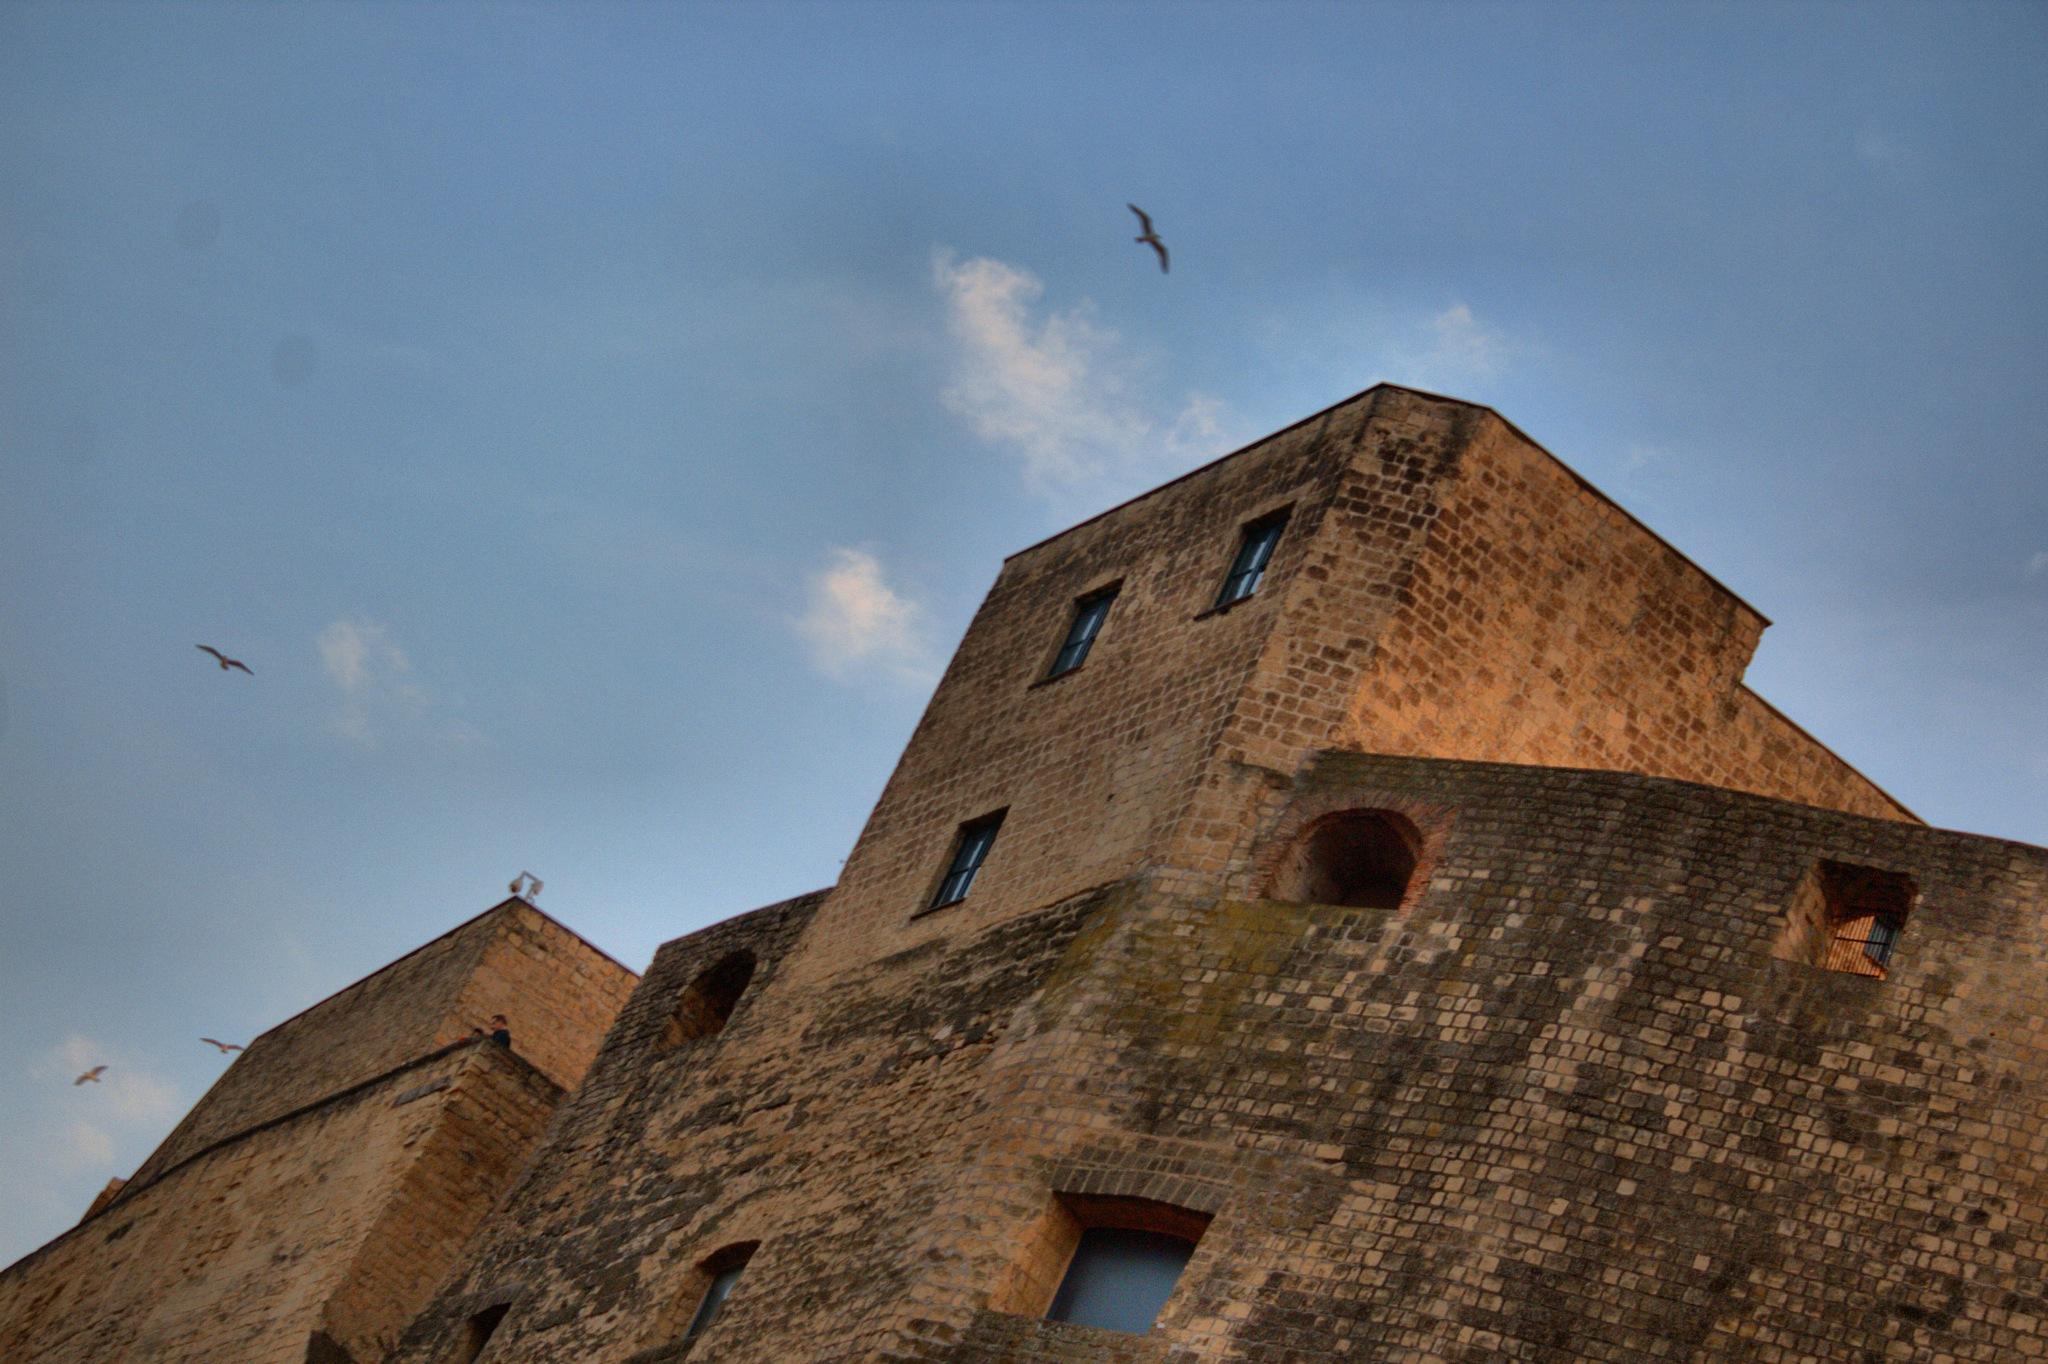 Naples - Castel dell'Ovo With Seagulls - 01 by Arnaldo De Lisio